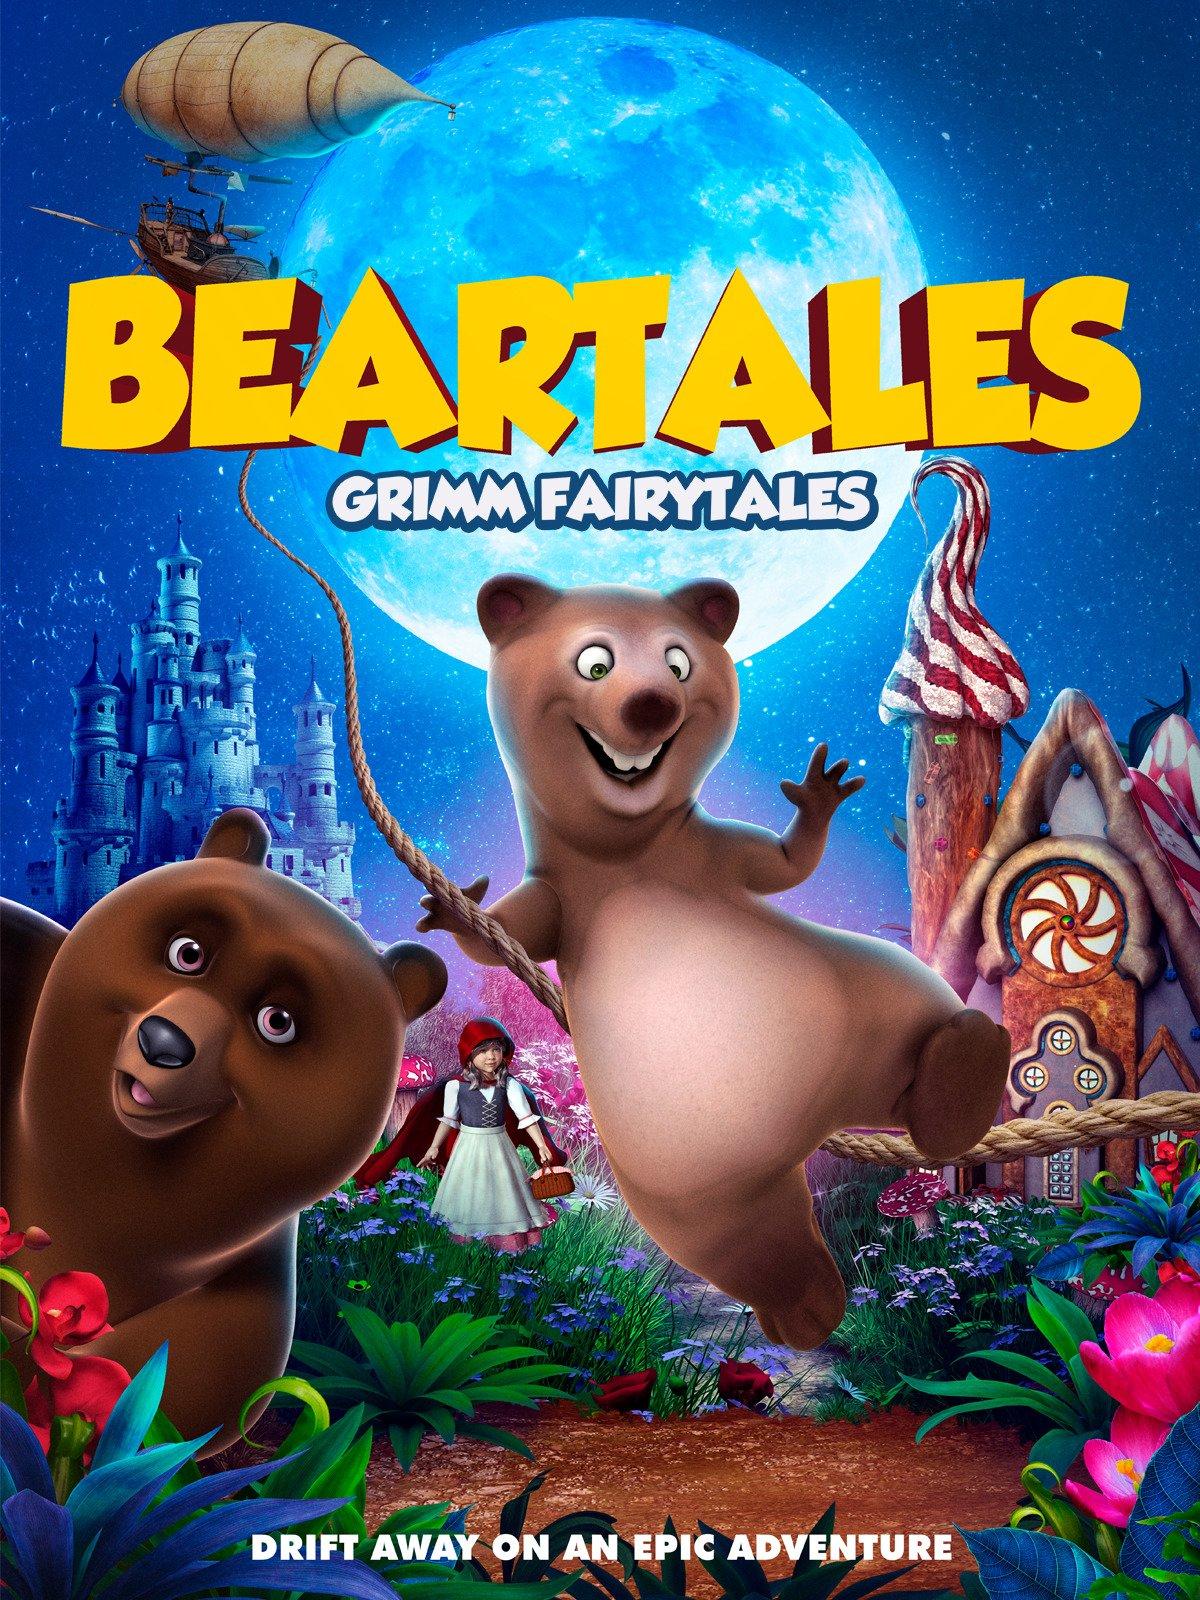 Beartales: Grimm Fairytales